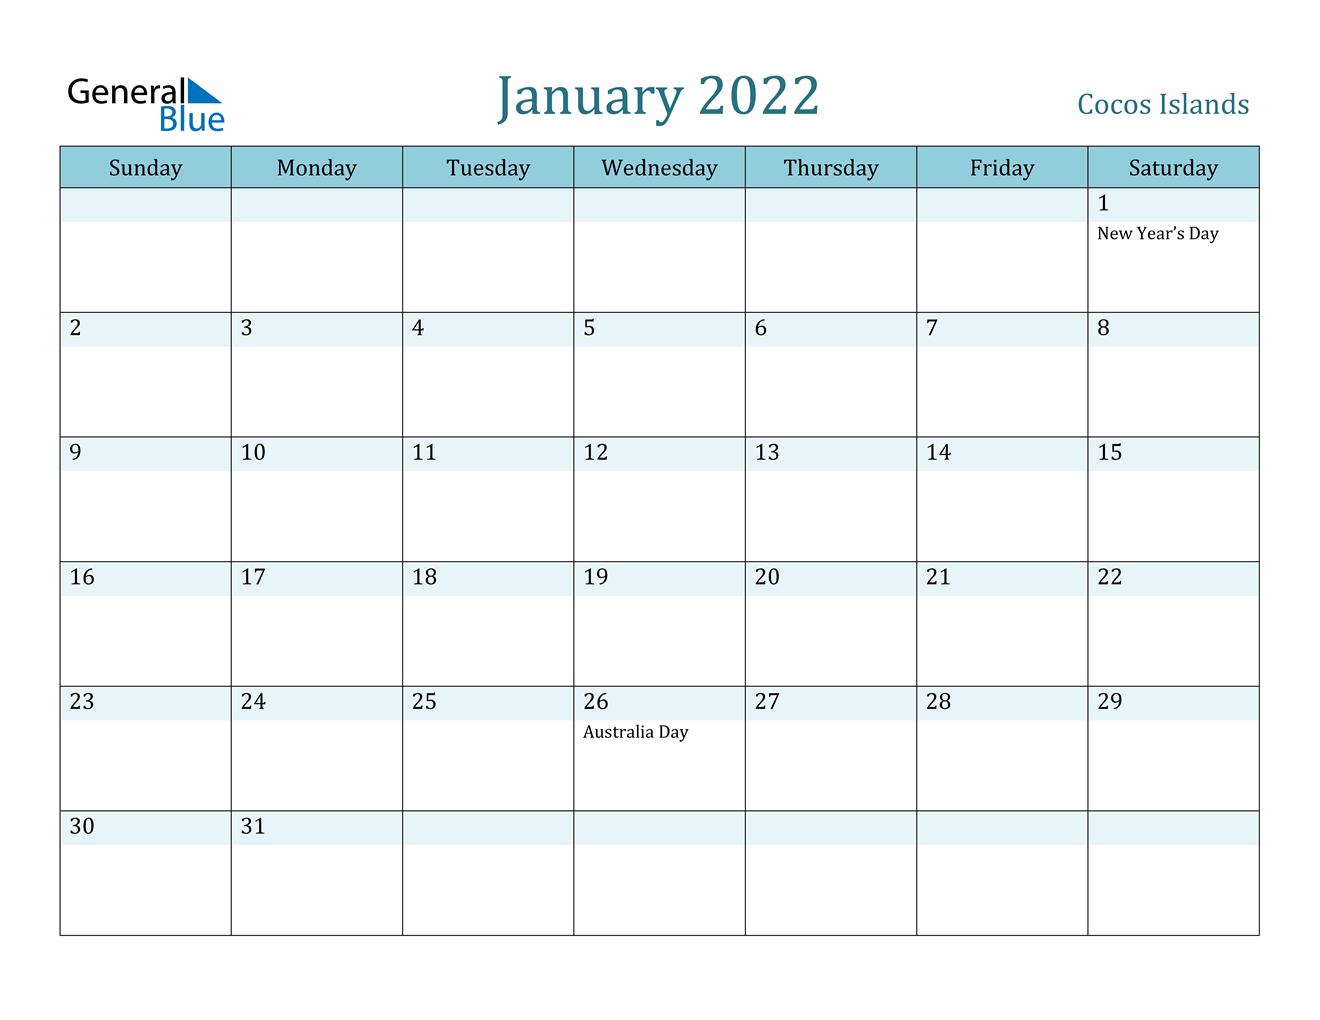 January 2022 Calendar - Cocos Islands Inside Blank January 2022 Calendar